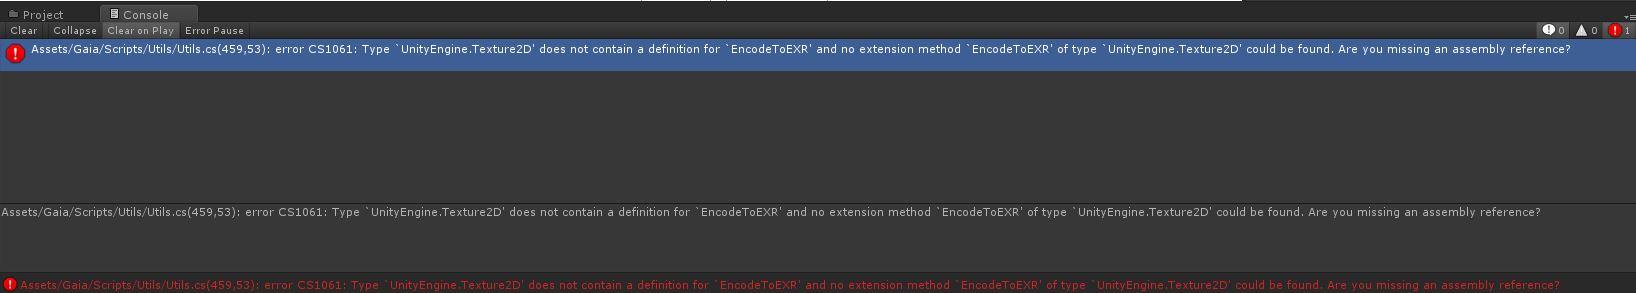 Utils_Error1061.JPG